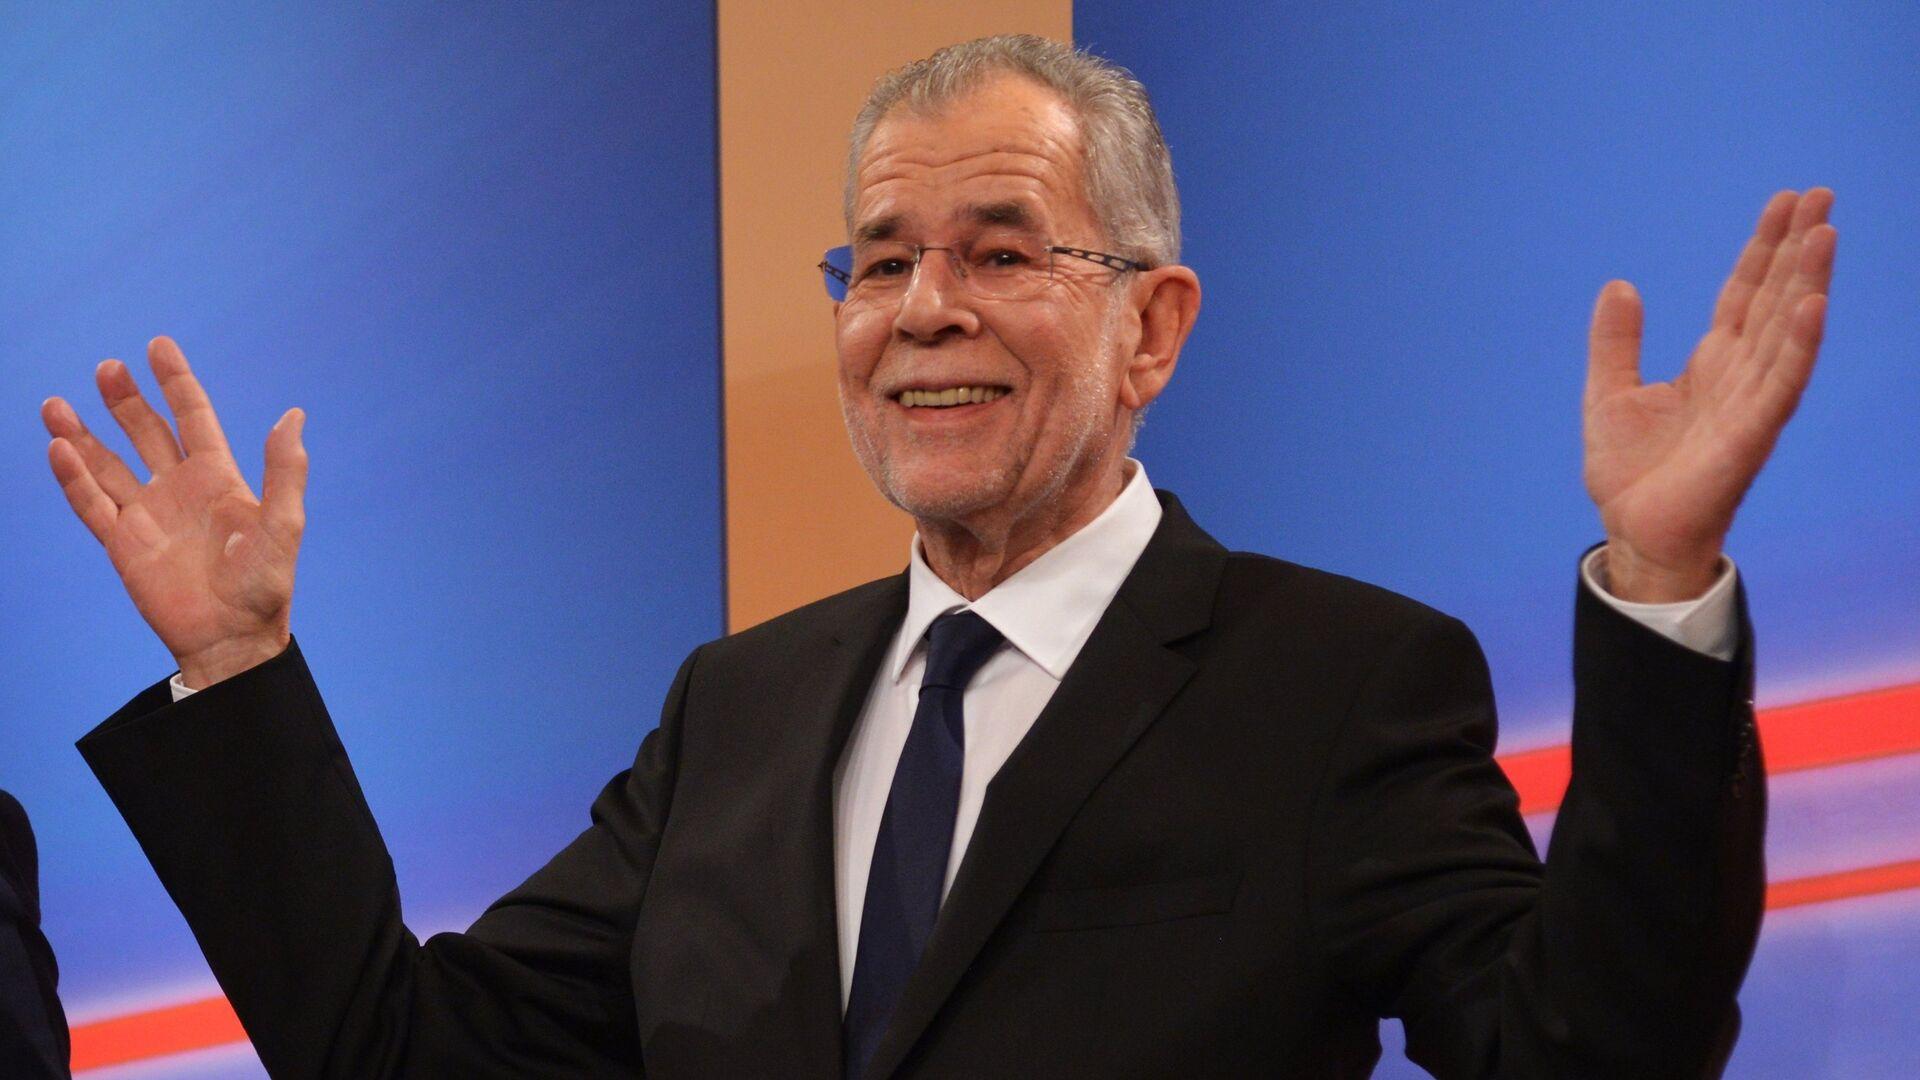 Кандидат на пост президента Австрии, бывший лидер зеленых Александр Ван дер Беллен - РИА Новости, 1920, 10.10.2021